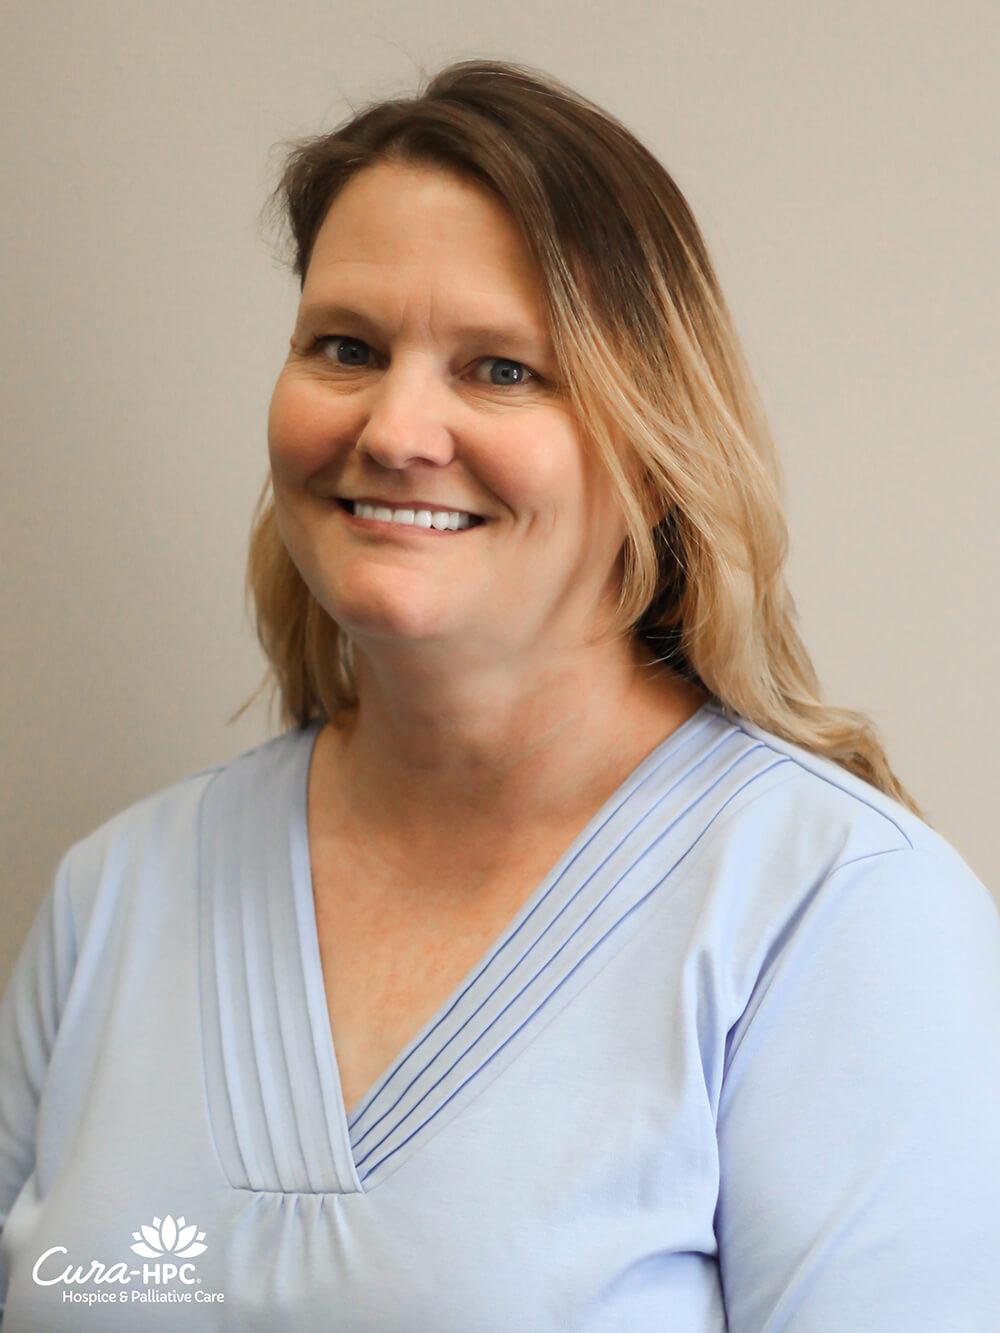 Kathy Hohneck